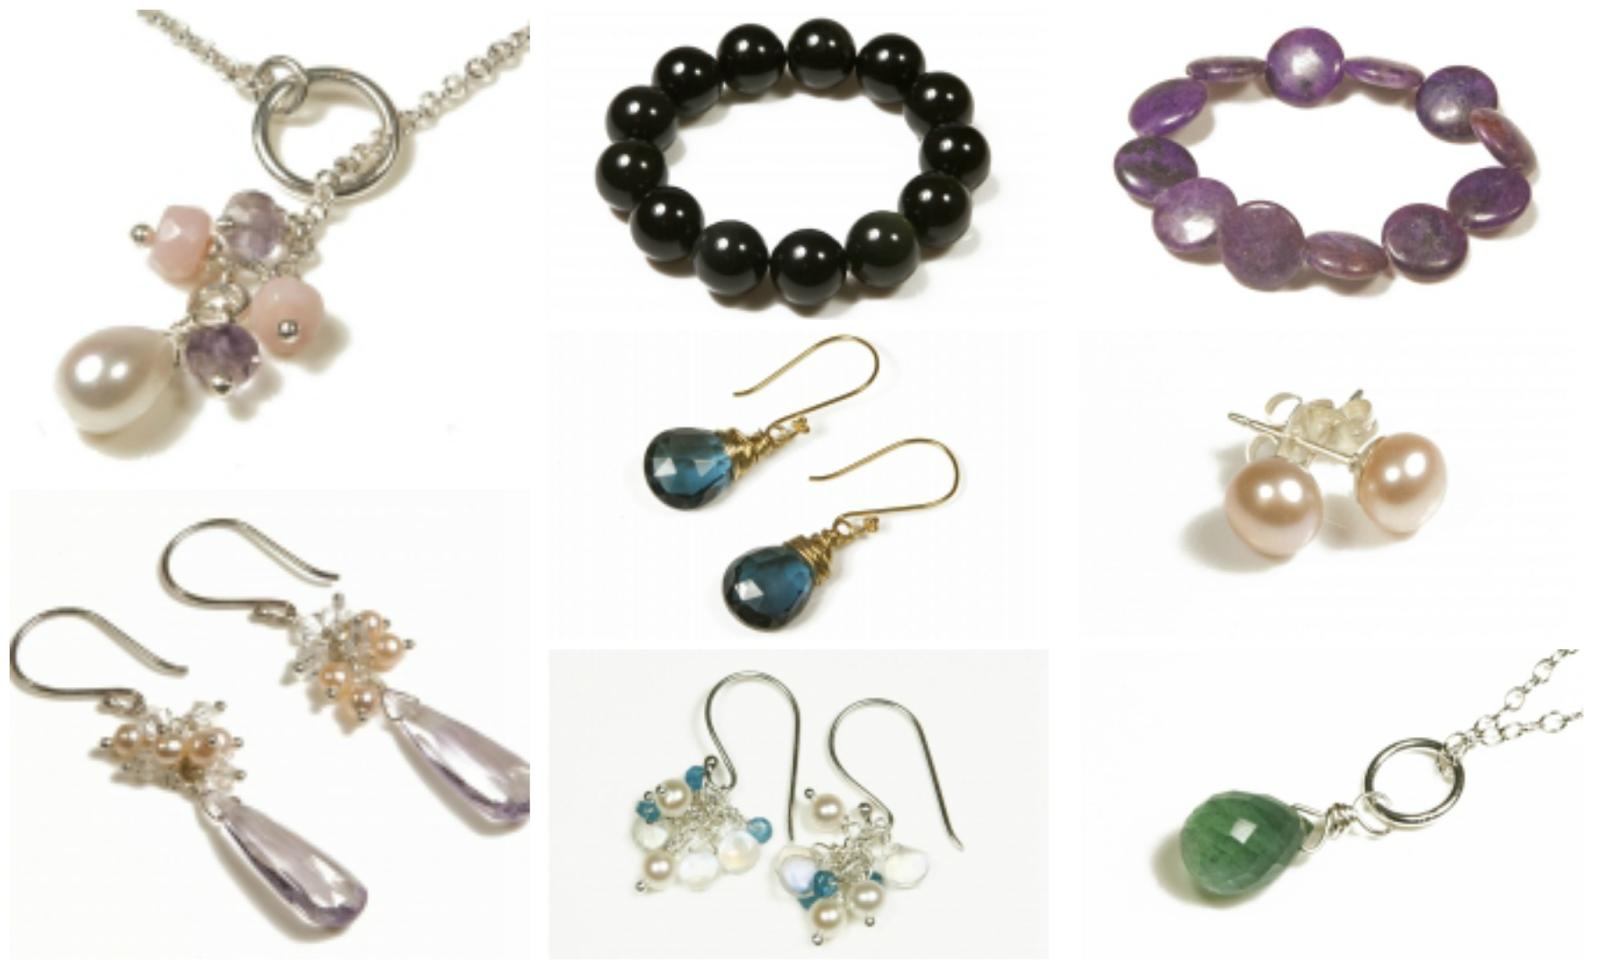 Sugarpuss London jewellery collage